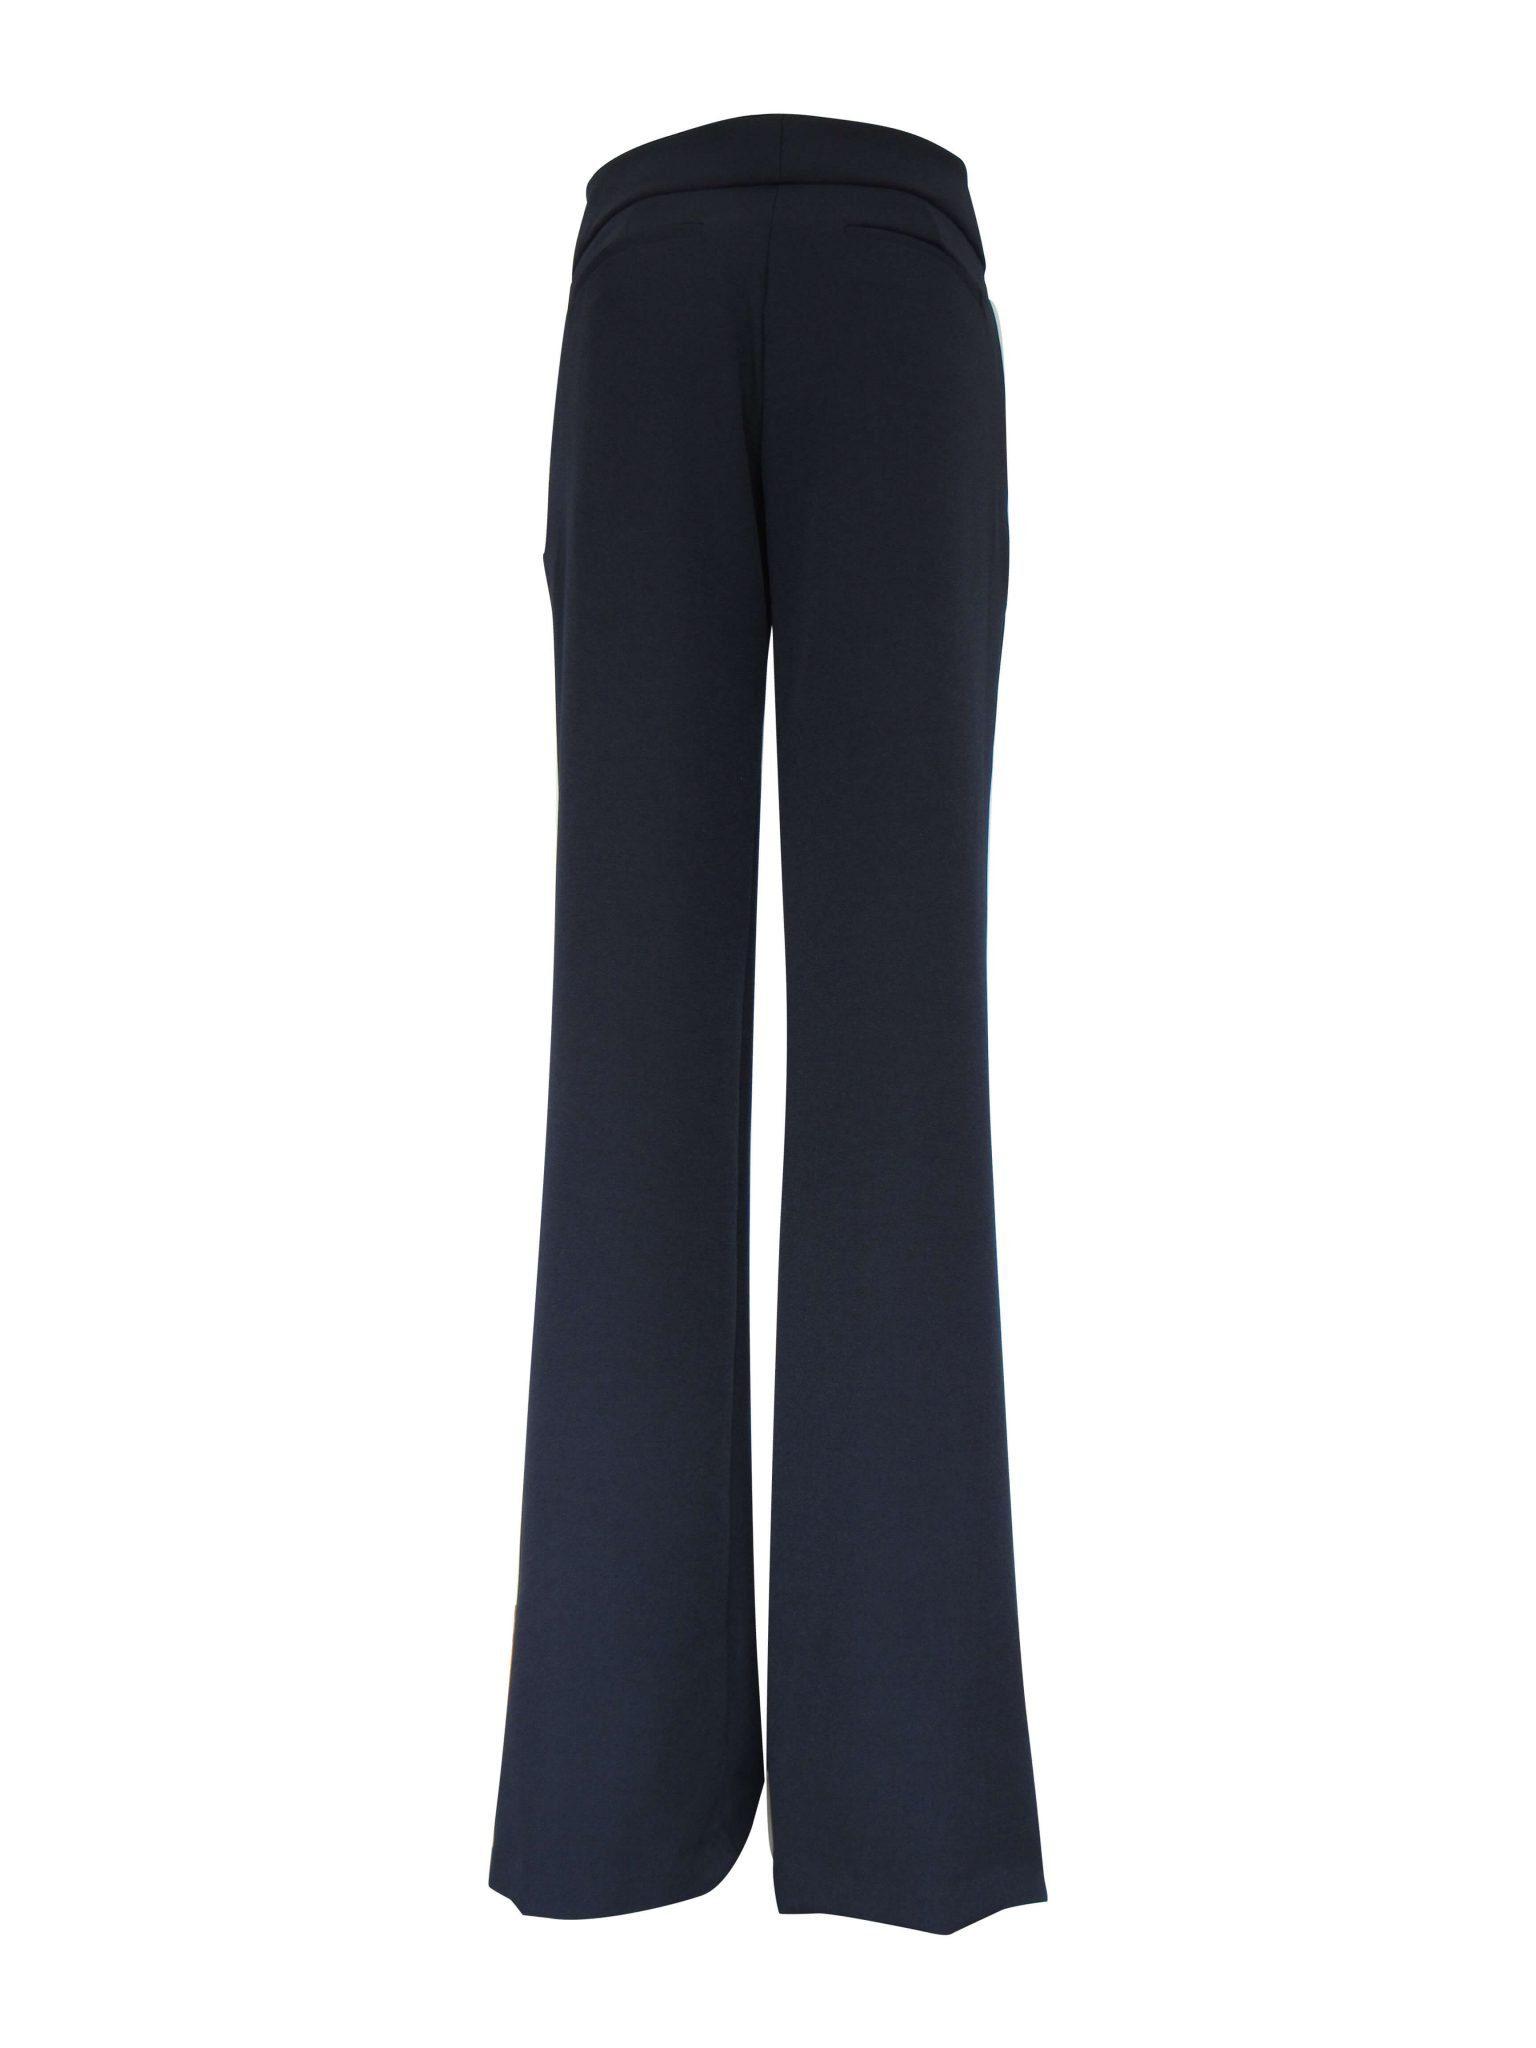 padova-pantalon-vera-navy-02